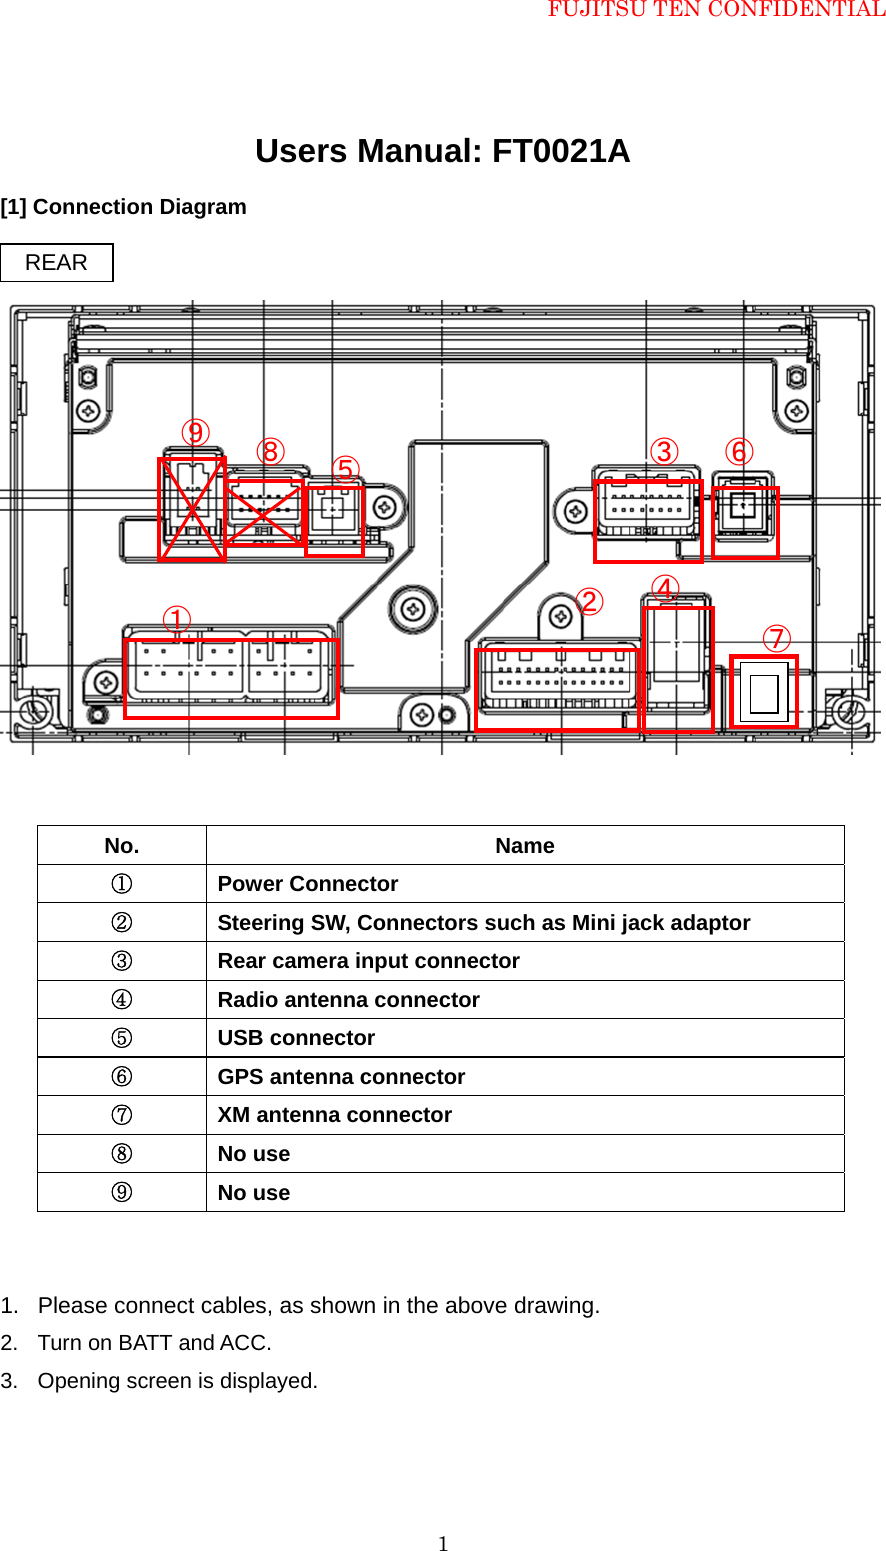 Display Wiring Diagram Denso Data Diagrams Nd Alternator Ten Ft0021a Car Navigation System With Bluetooth User Manual Rh Usermanual Wiki O2 Sensor